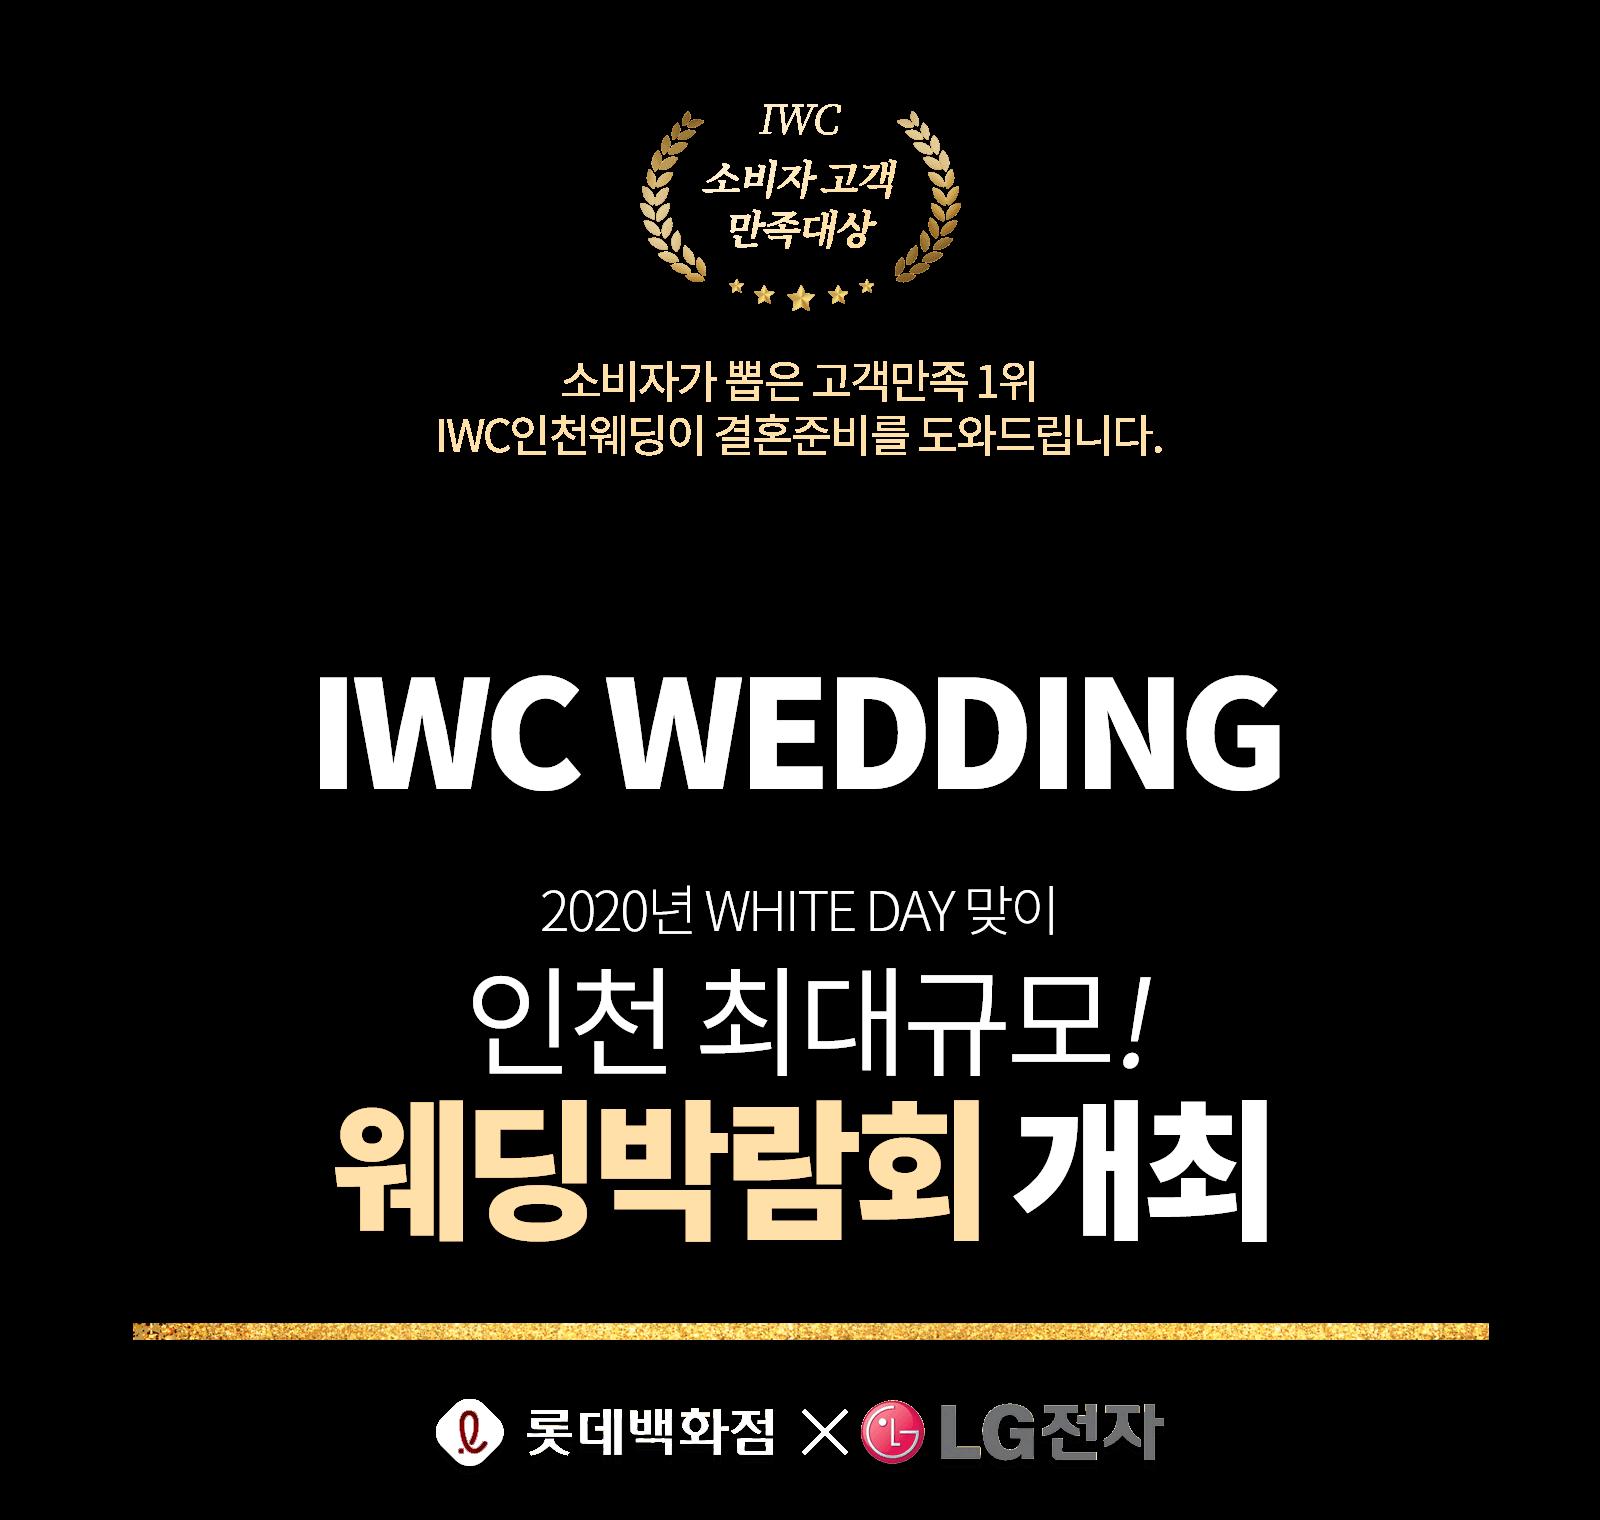 LG전자 인천 최대규모 웨딩박람회 개최